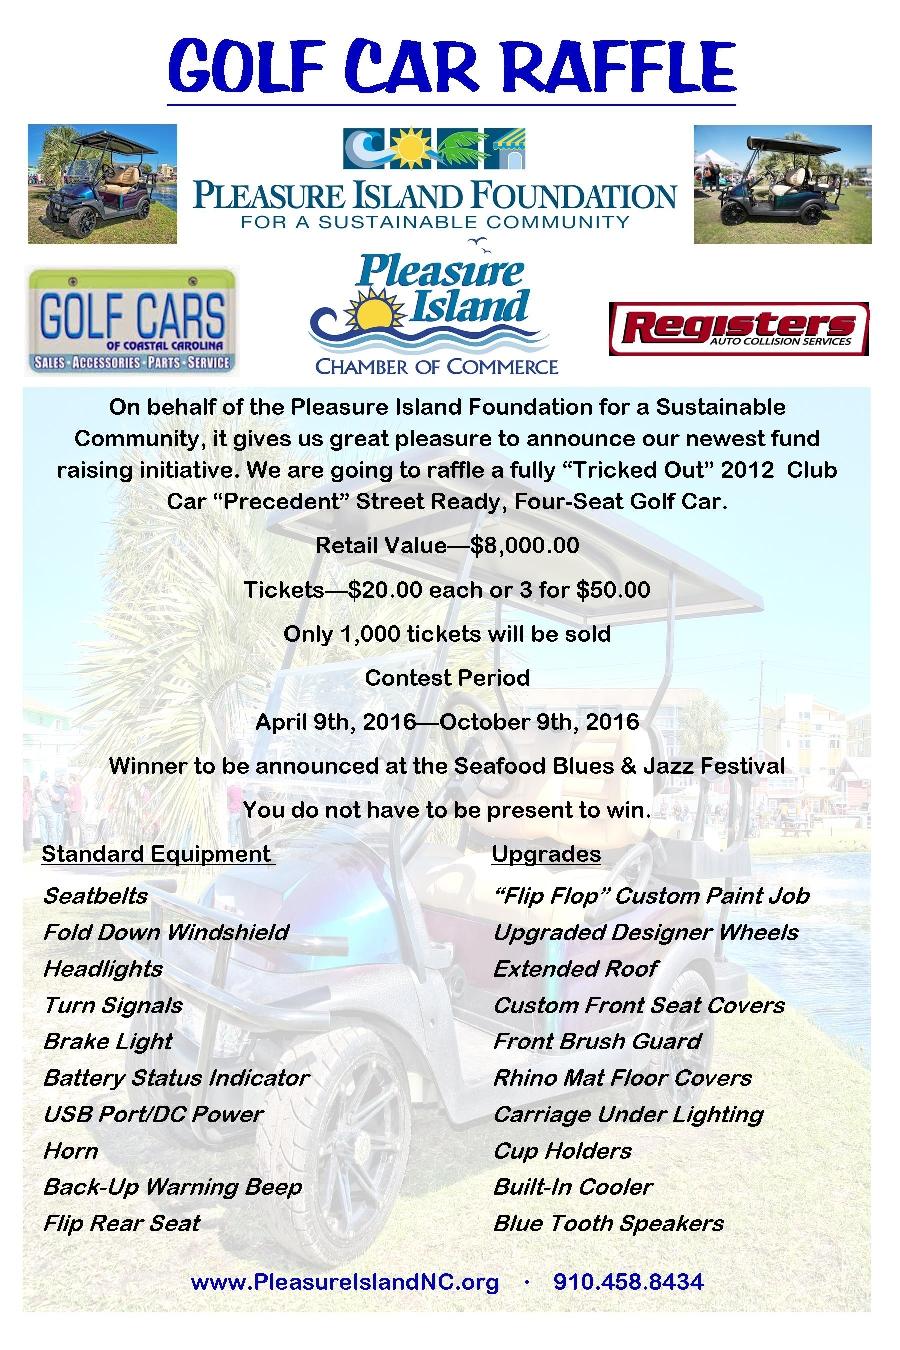 Pleasure Island, NC: Golf Car Raffle!